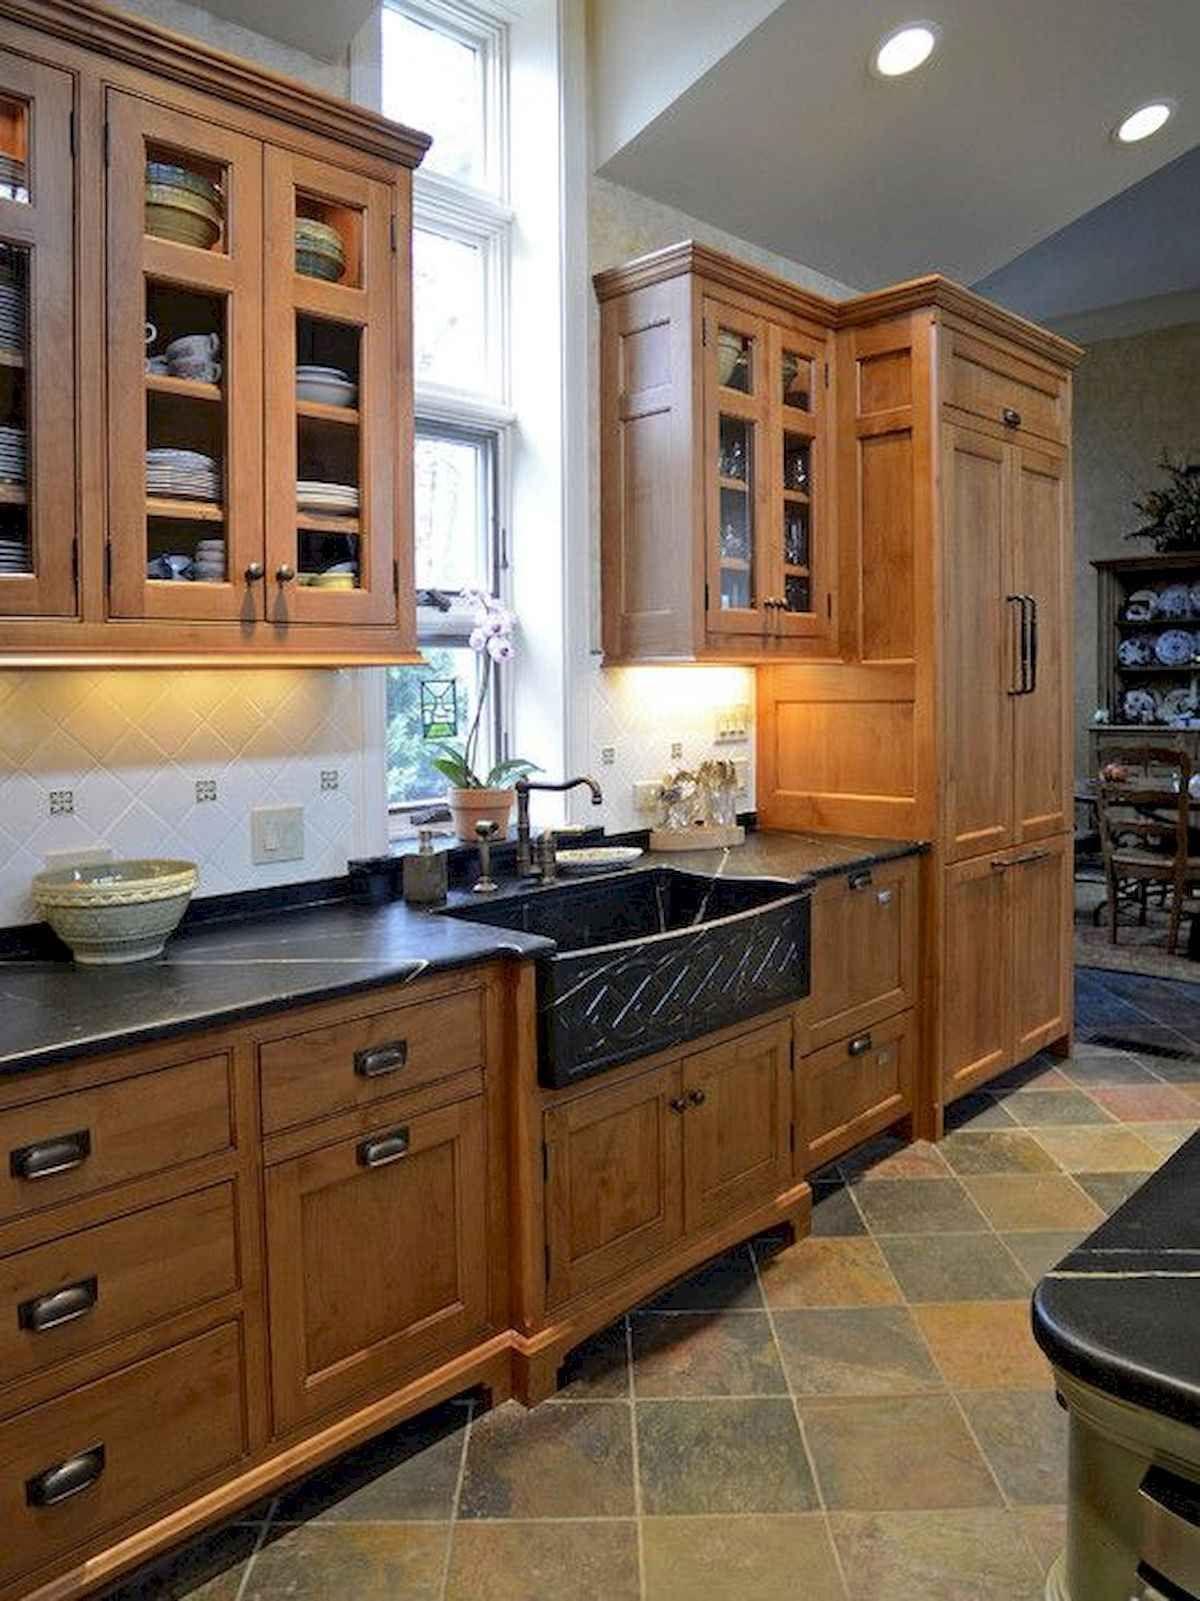 40 Awesome Craftsman Style Kitchen Design Ideas 22 Rustic Kitchen Cabinets Farmhouse Style Kitchen Cabinets Kitchen Cabinet Styles